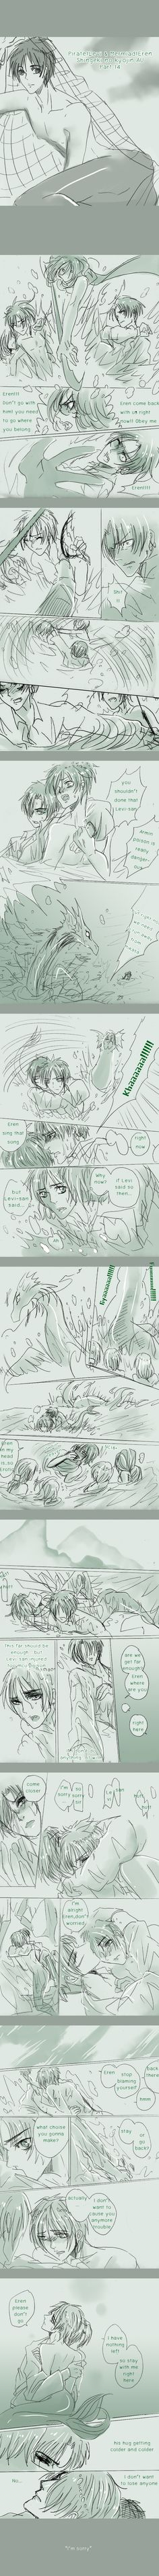 SnK'AU : Pirate!Levi x Mermaid!Eren part14 by illuscarymono.deviantart.com on @DeviantArt